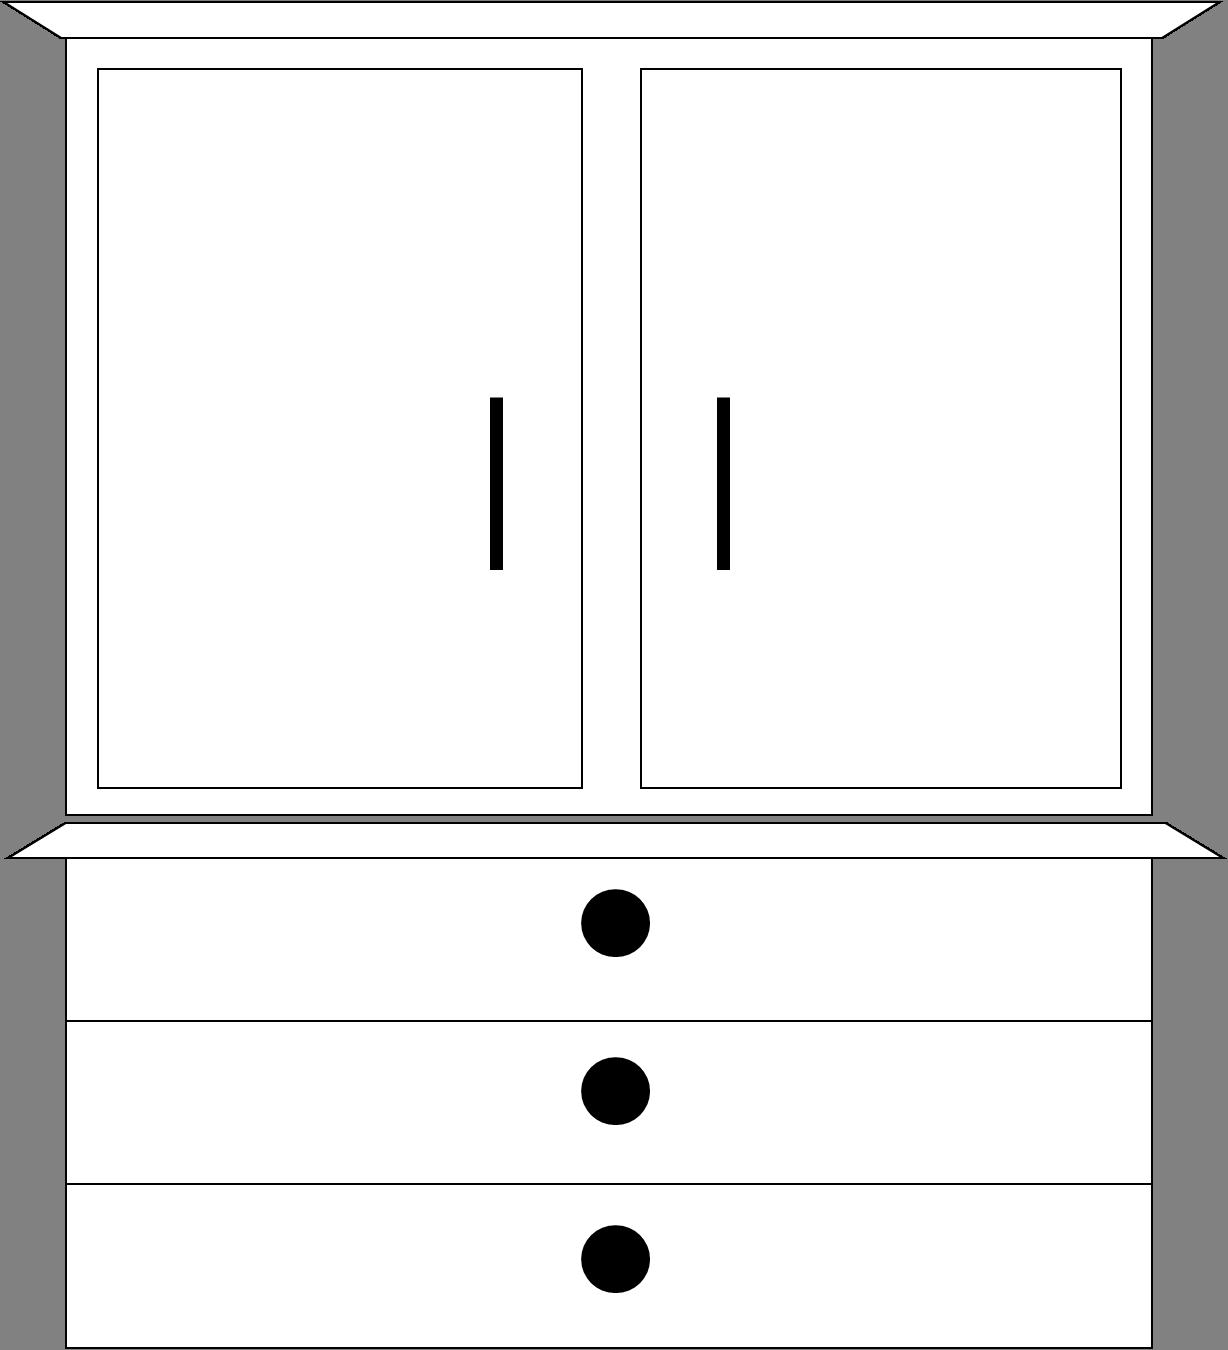 Dresser Bw | Free Images at Clker.com - vector clip art ...